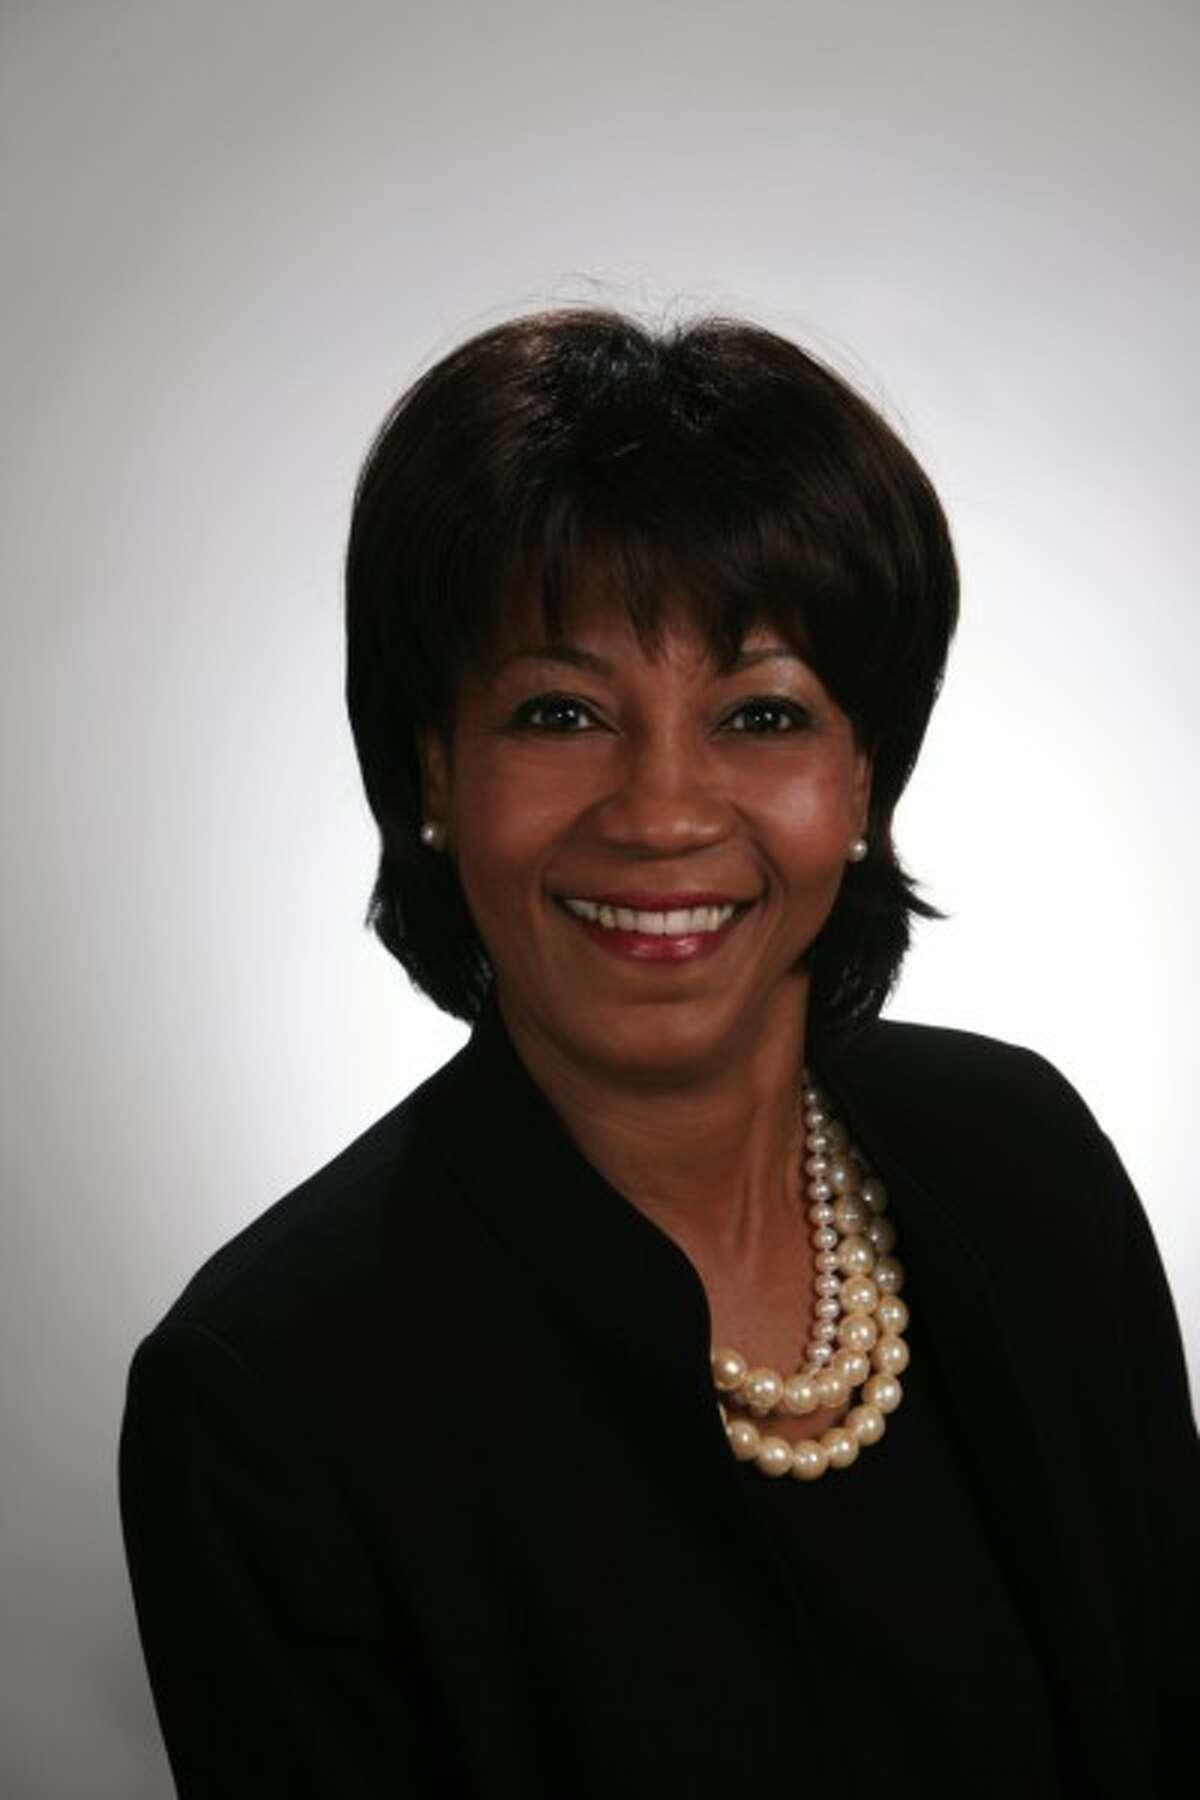 Ann Harris Bennett, Democratic candidate for Harris County Tax Assessor-Collector.